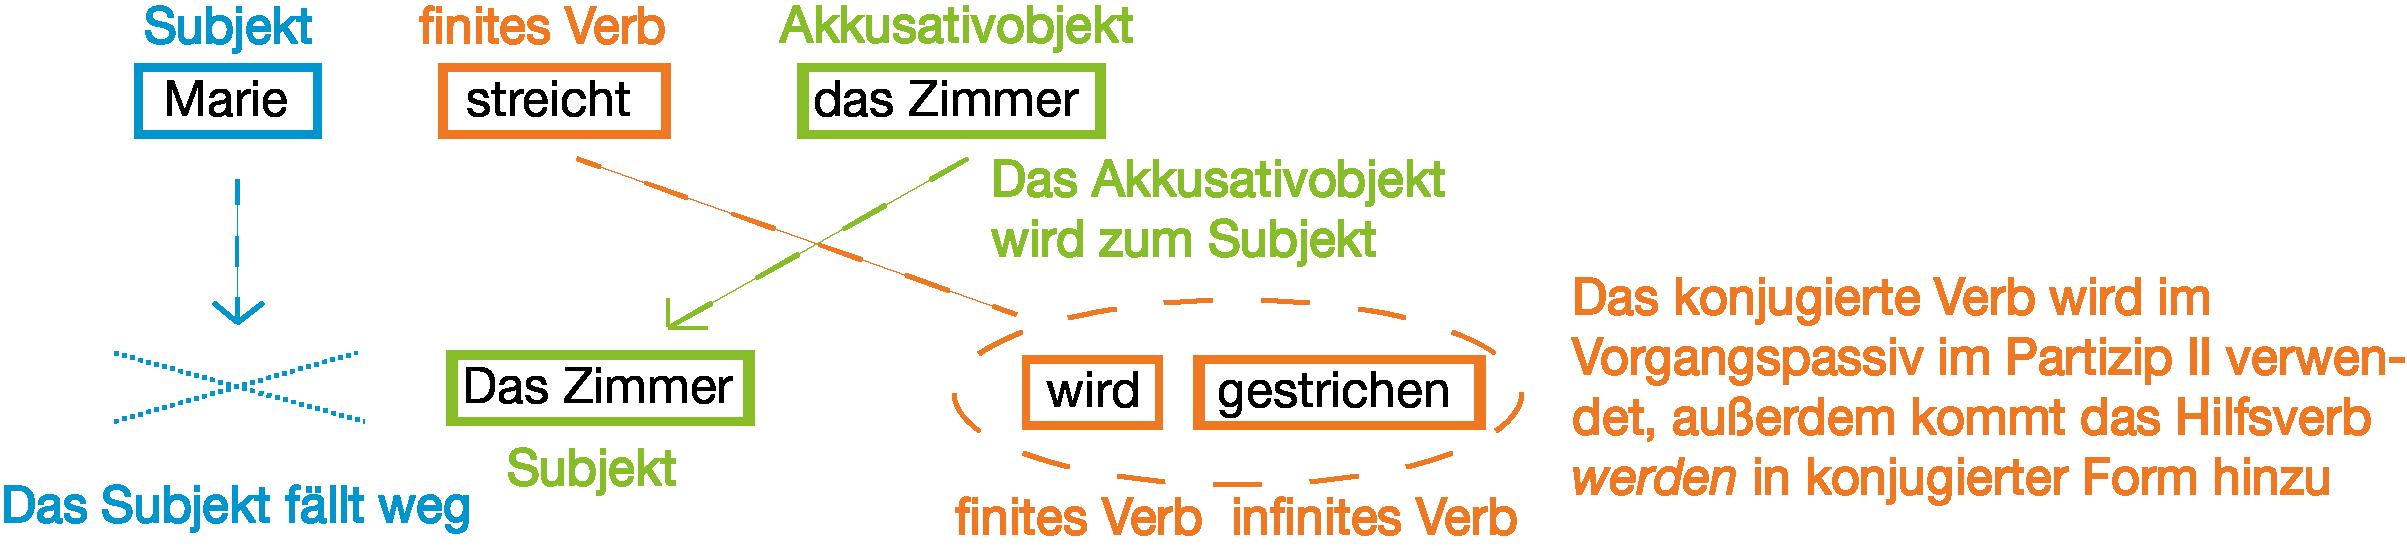 Grammatik: Aktiv/Passiv